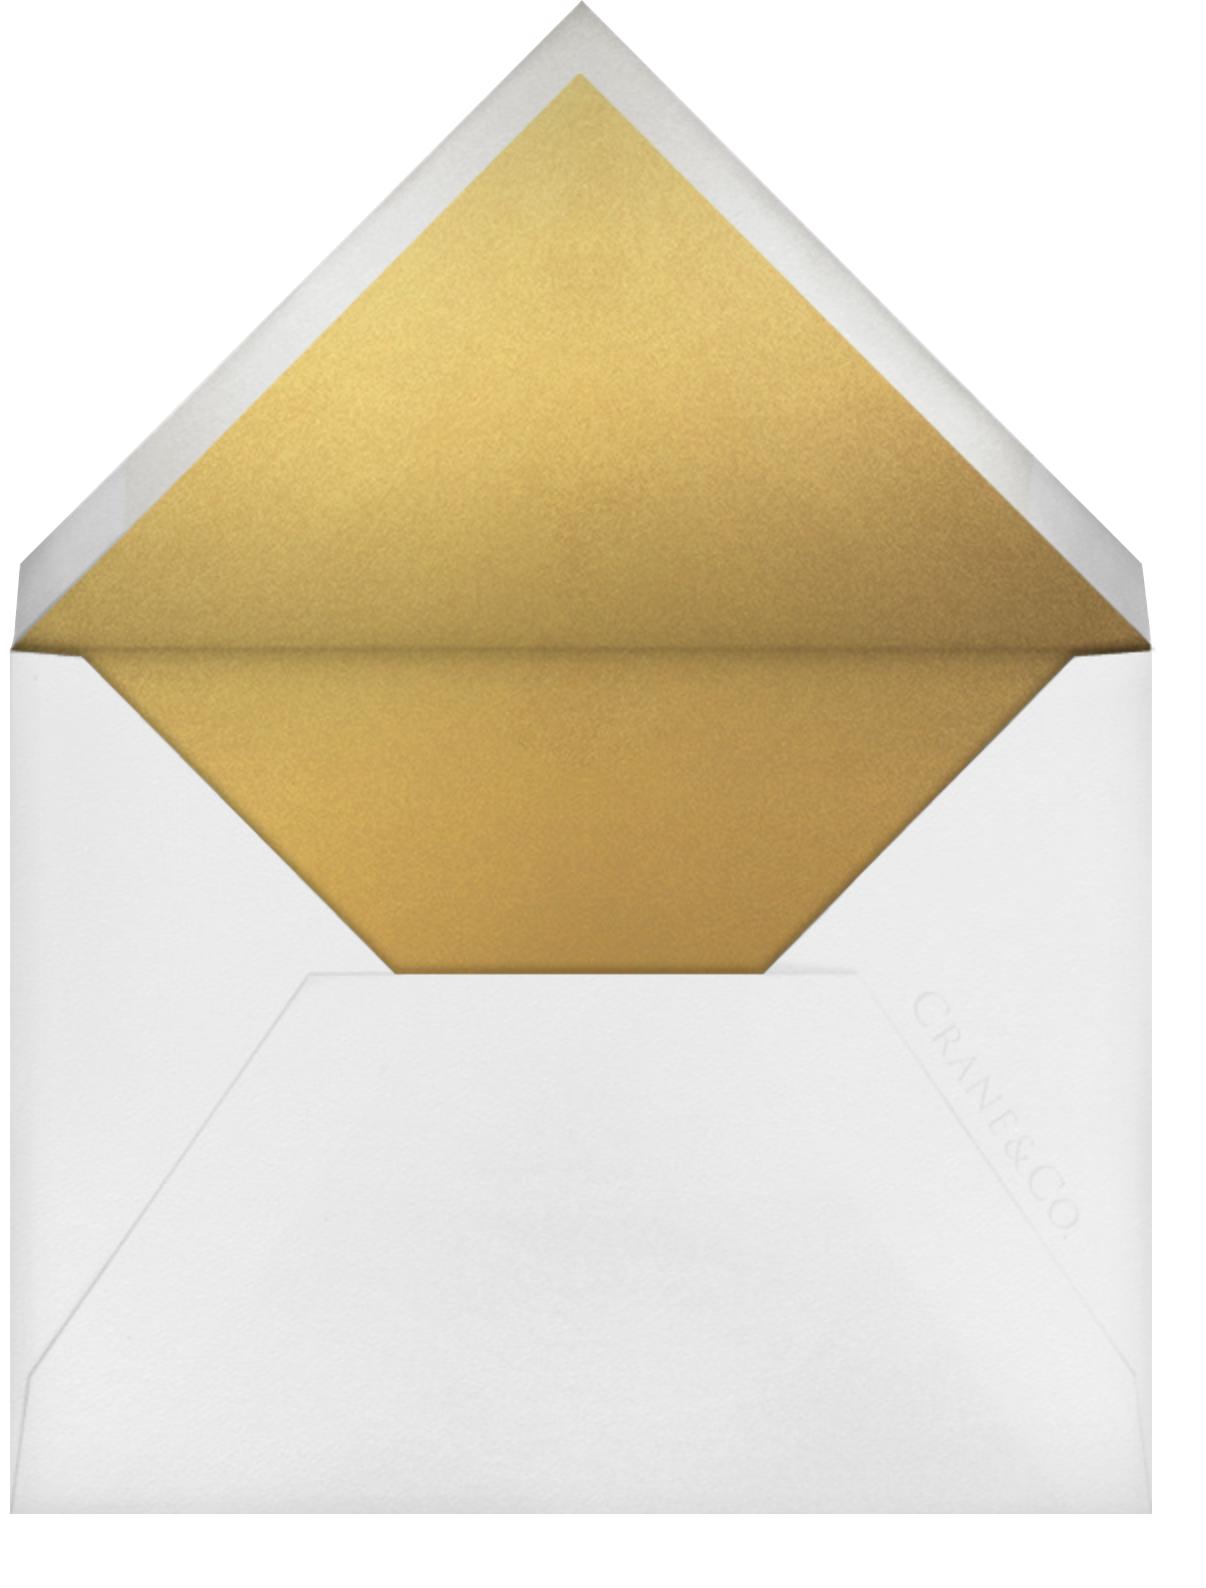 Hydrangea Lace II - Gold - Oscar de la Renta - Envelope